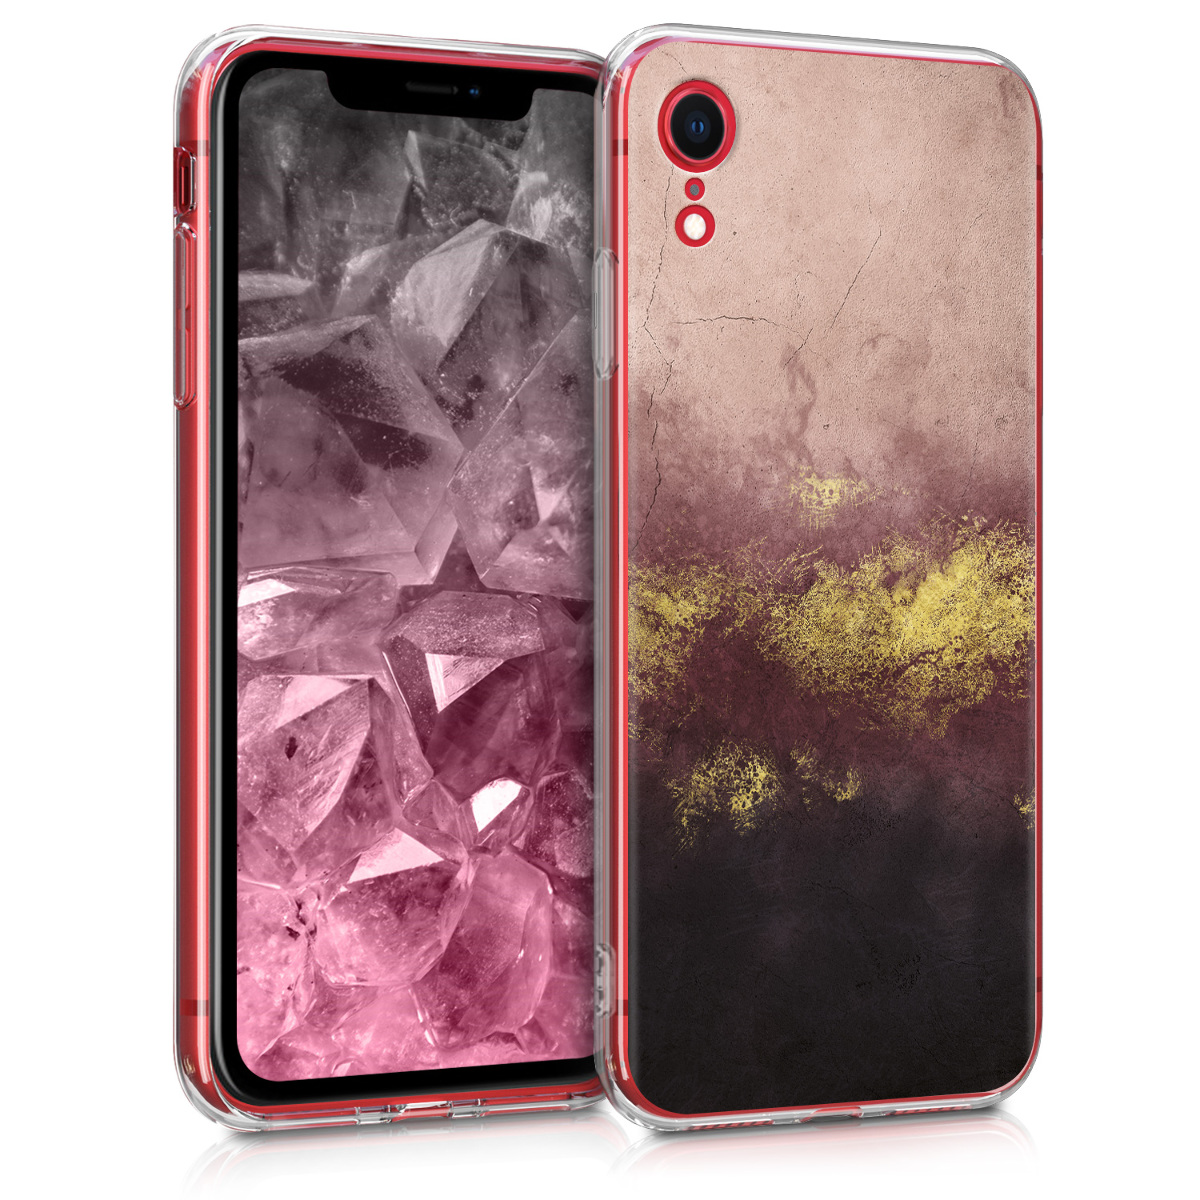 Kvalitní silikonové TPU pouzdro pro Apple iPhone XR - Metallic Granite Gold | Dusty Pink | Black